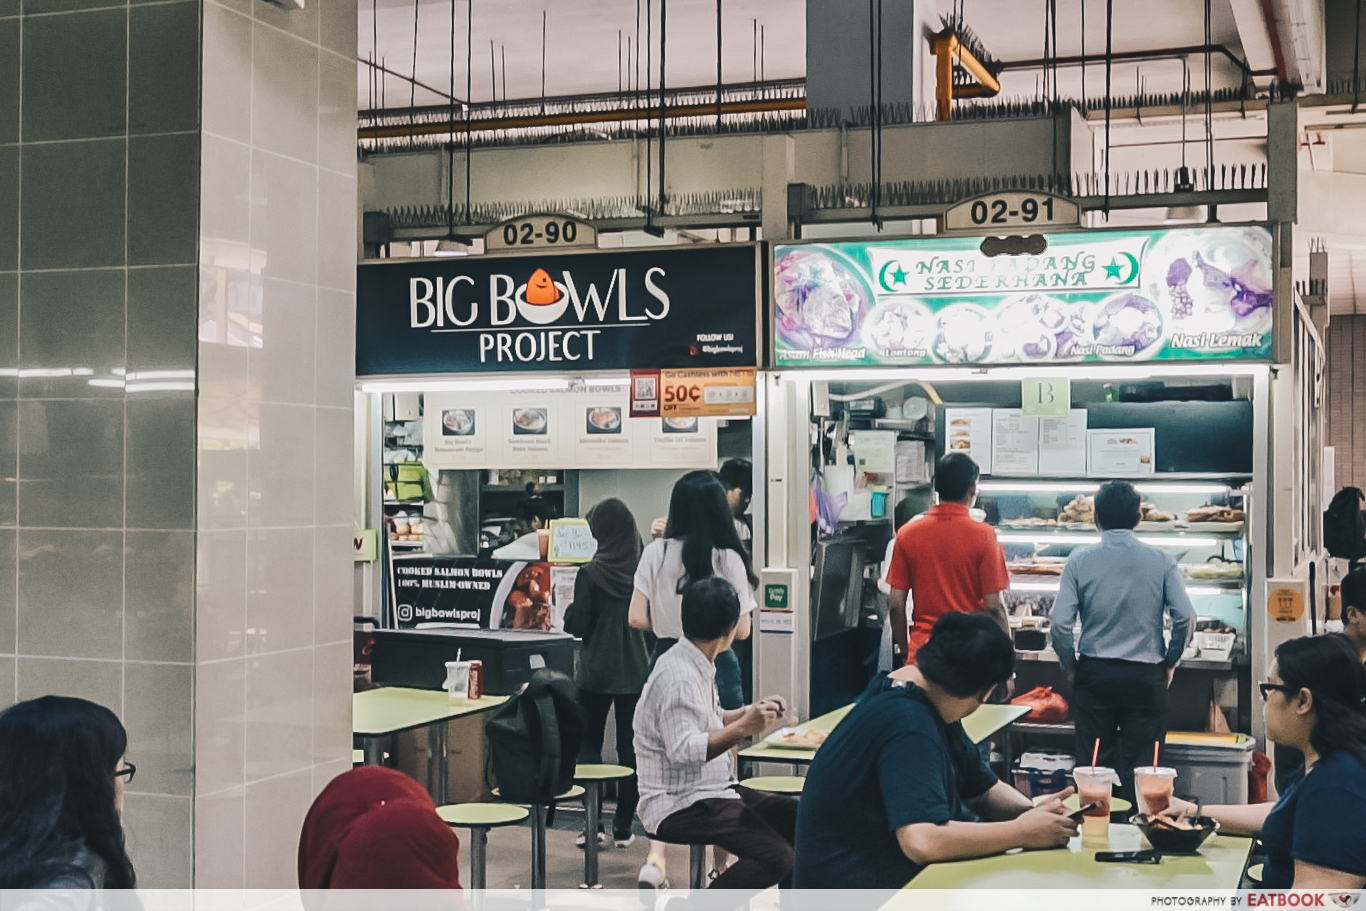 Big Bowls Project- ambience